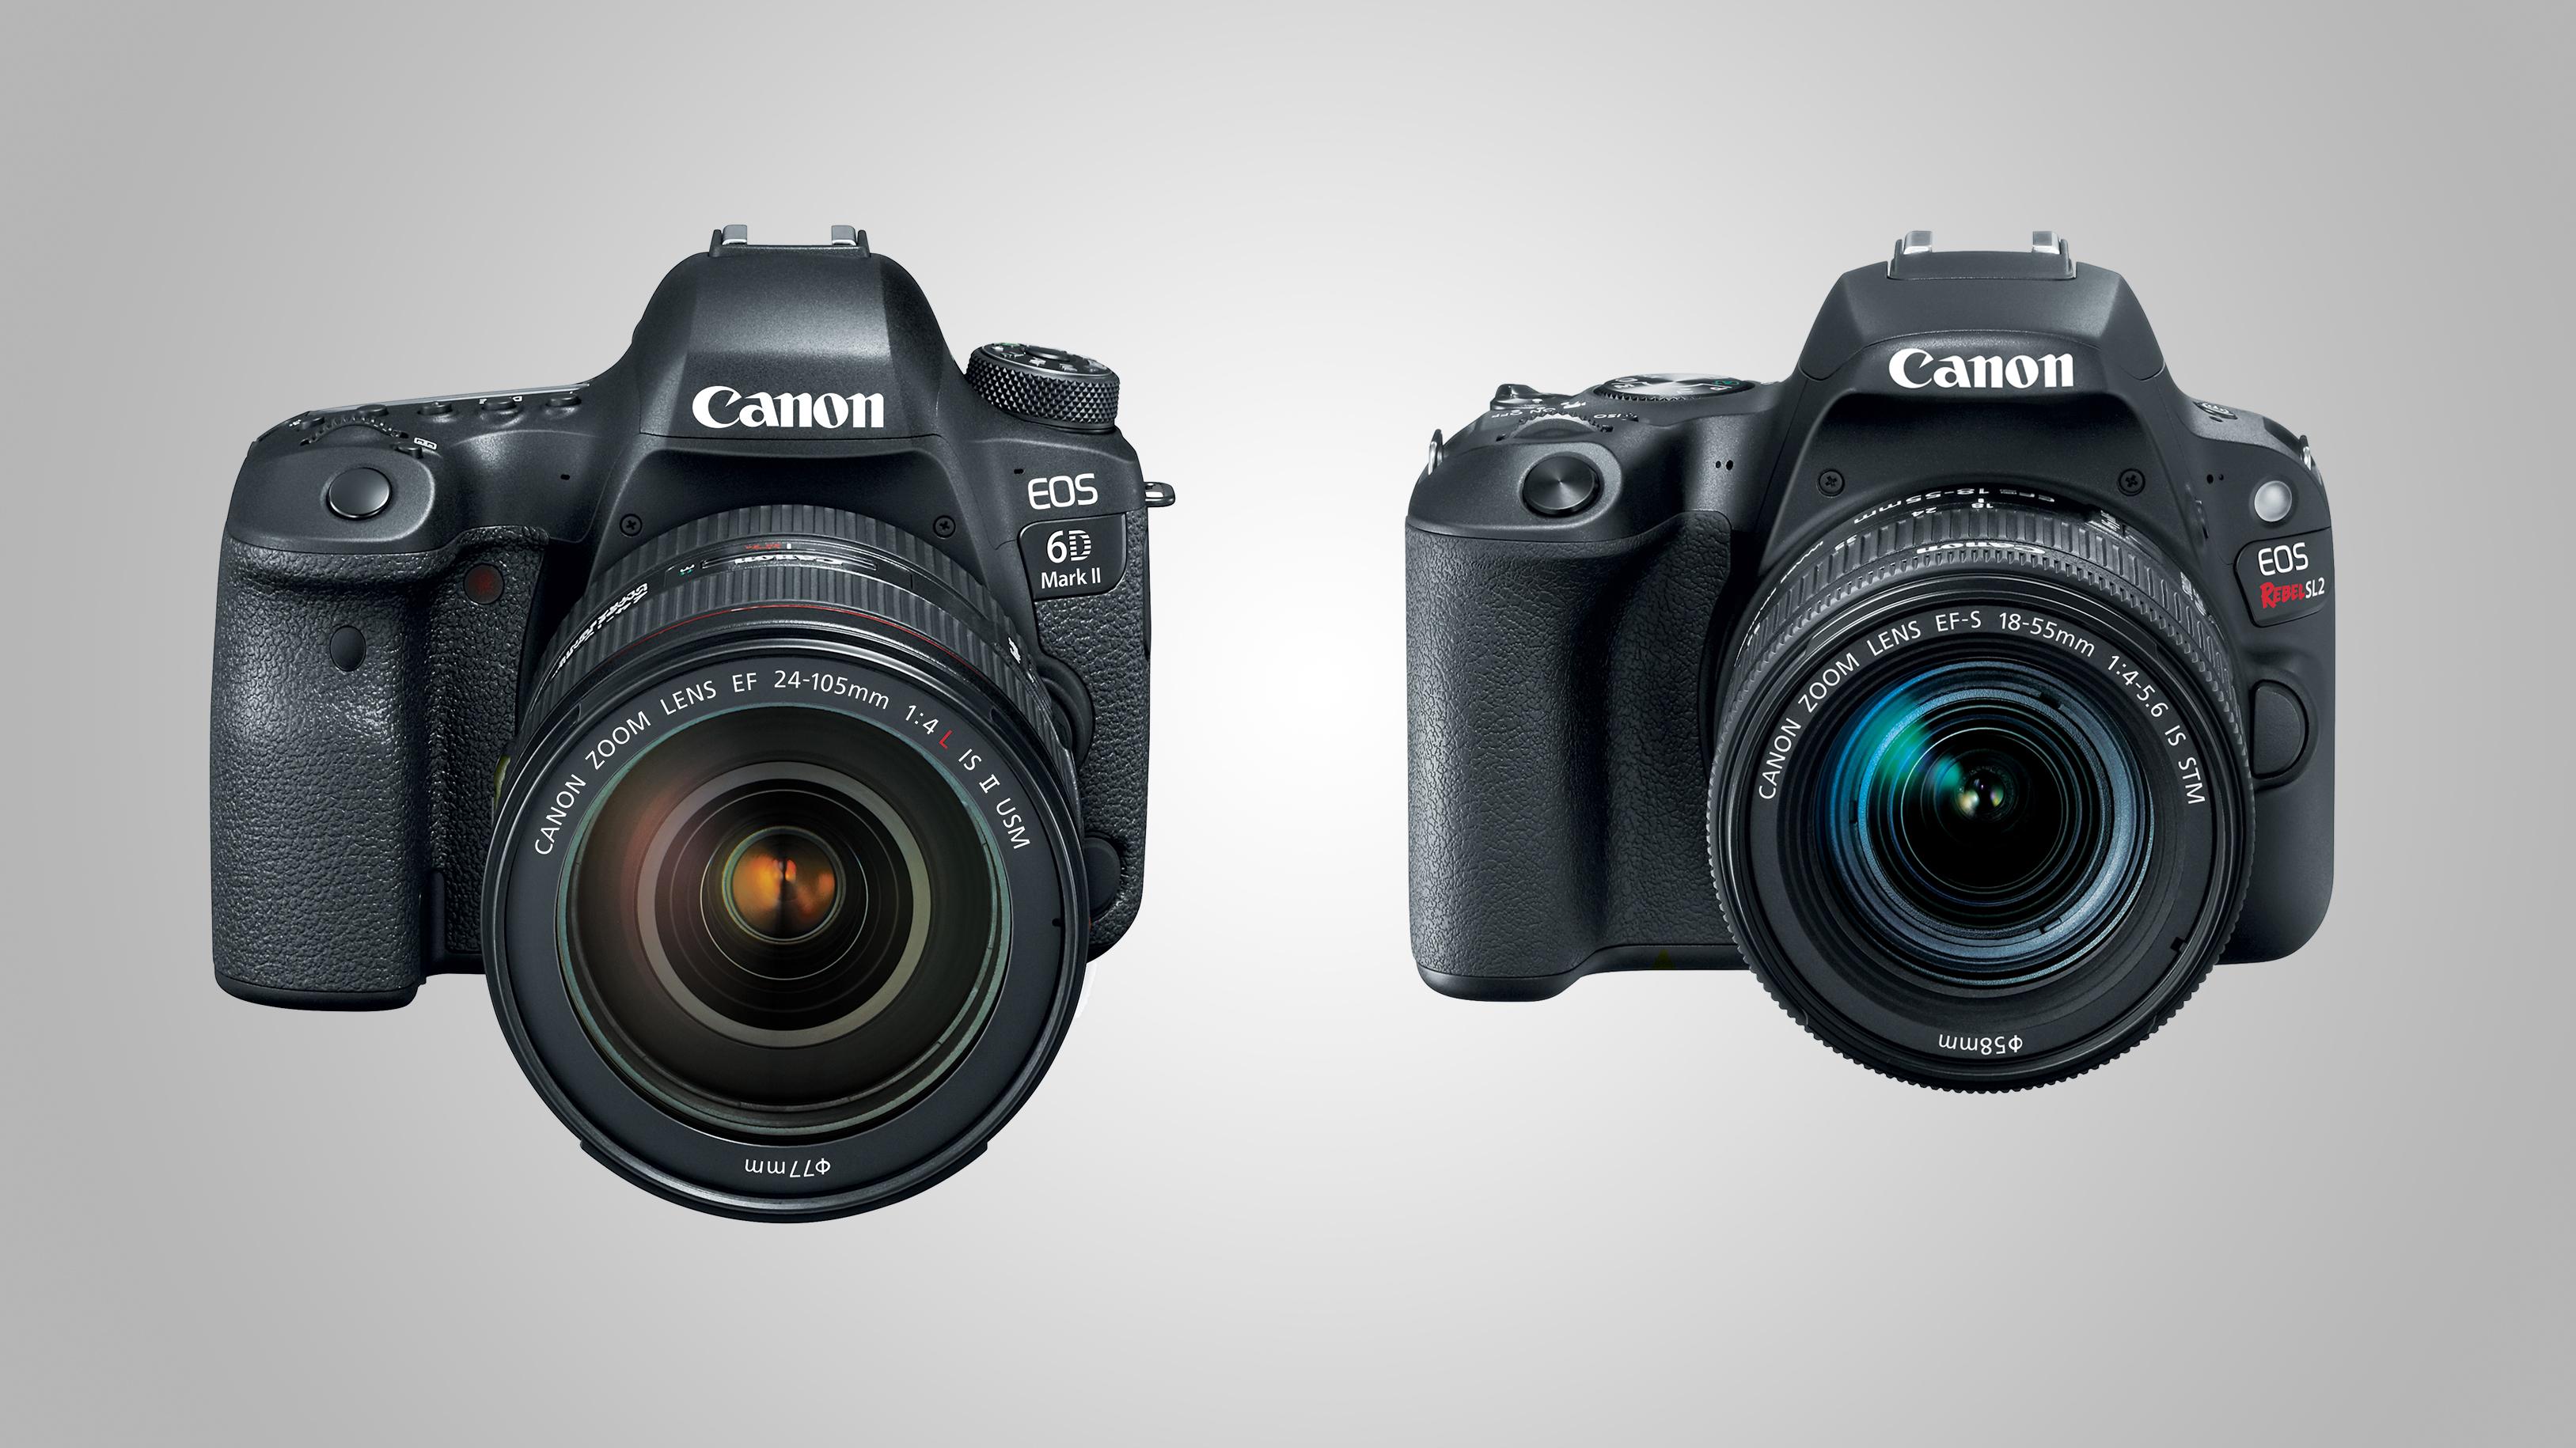 Canon unveils EOS 6D Mark II and EOS Rebel SL2 | TechRadar